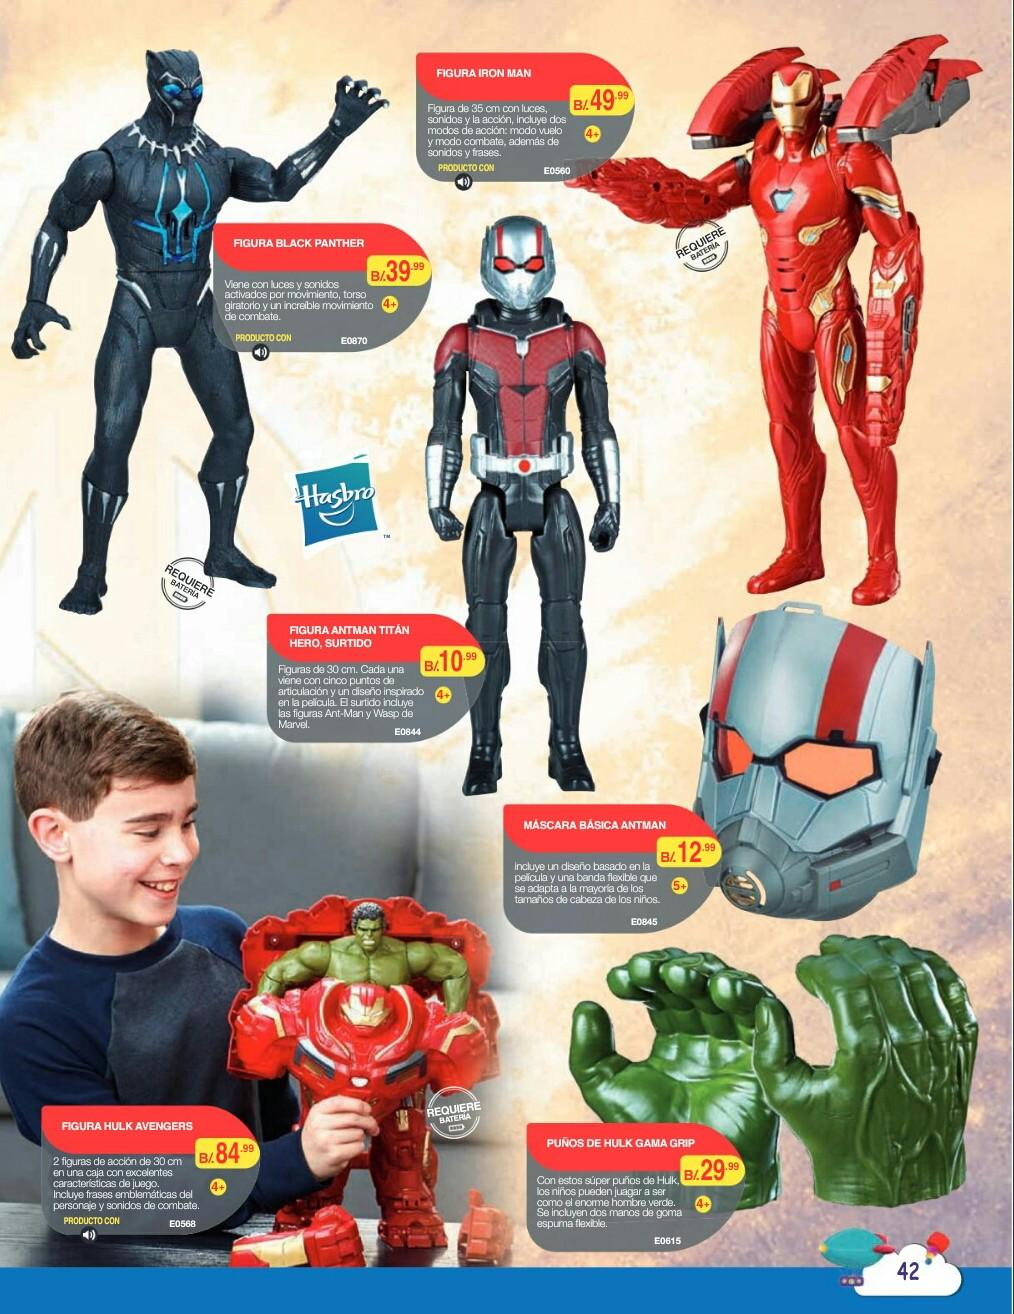 Catalogo juguetes Titan Toys 2018 p43